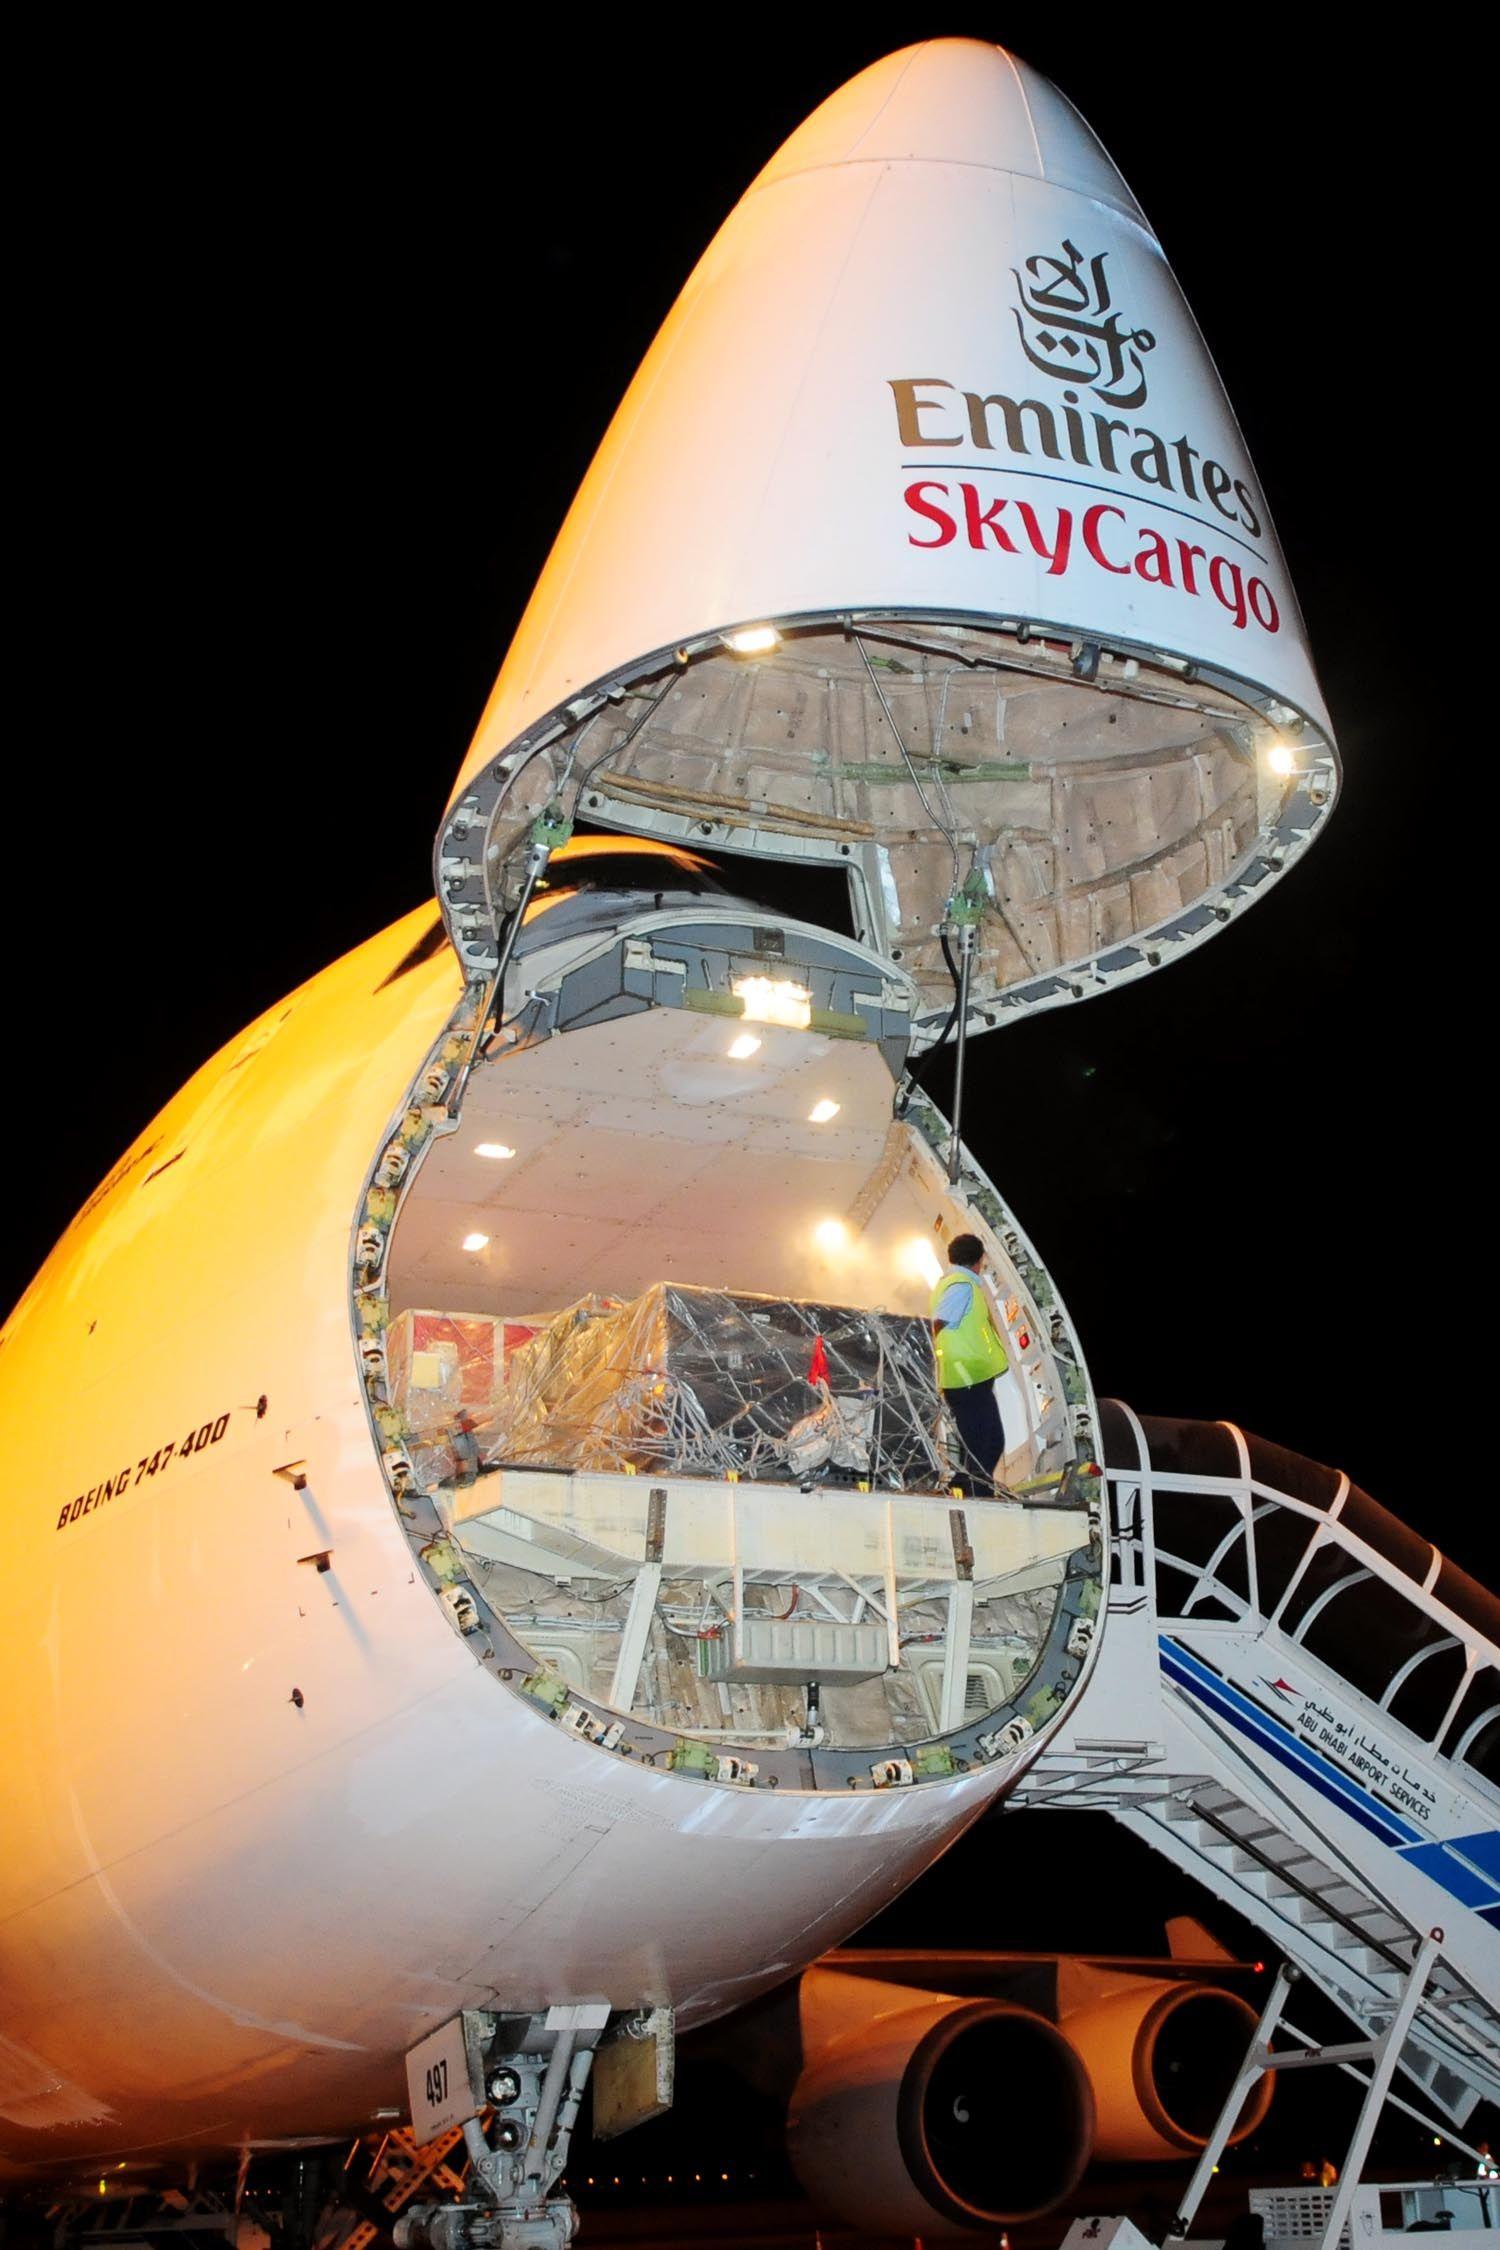 Emirates Skycargo Boeing 747 Freighter Cargo Airlines